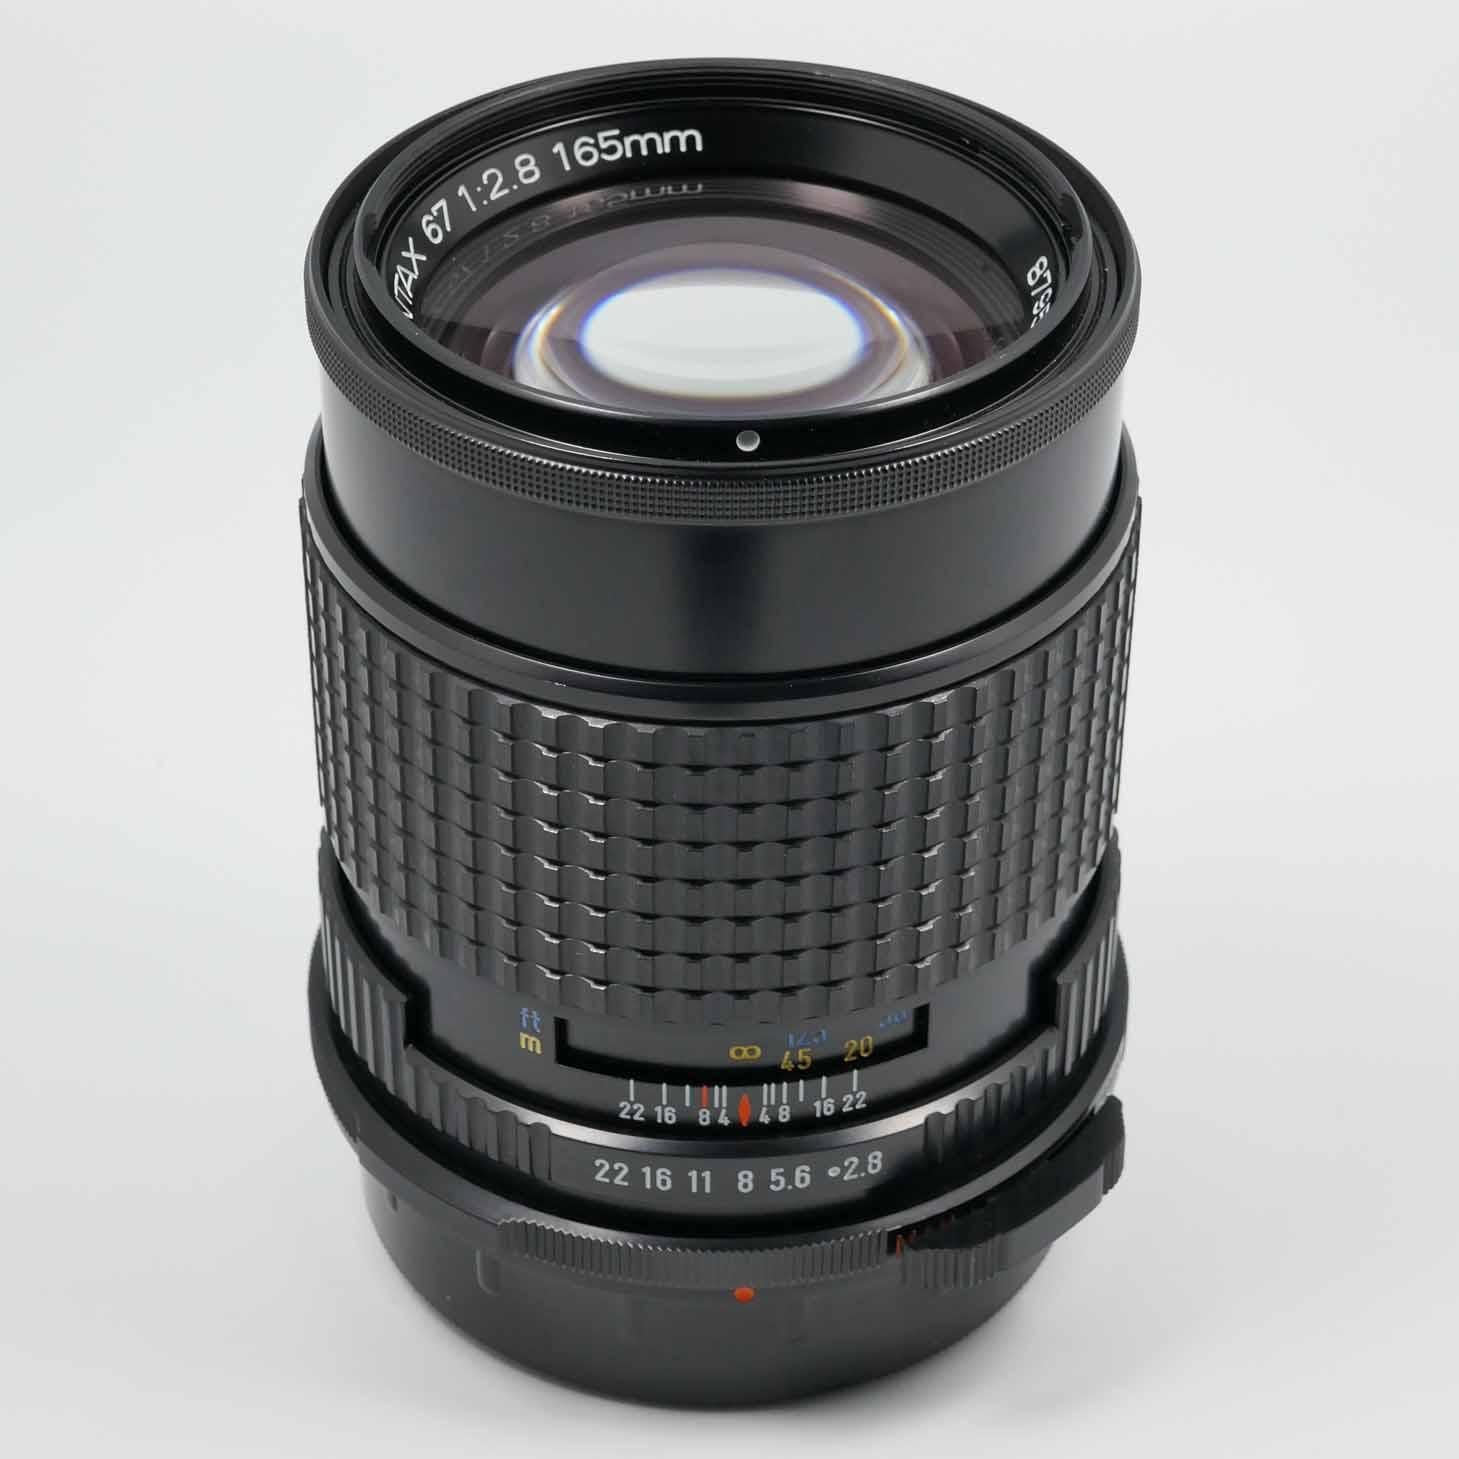 clean-cameras-Pentax-67-165mm-2.8-07